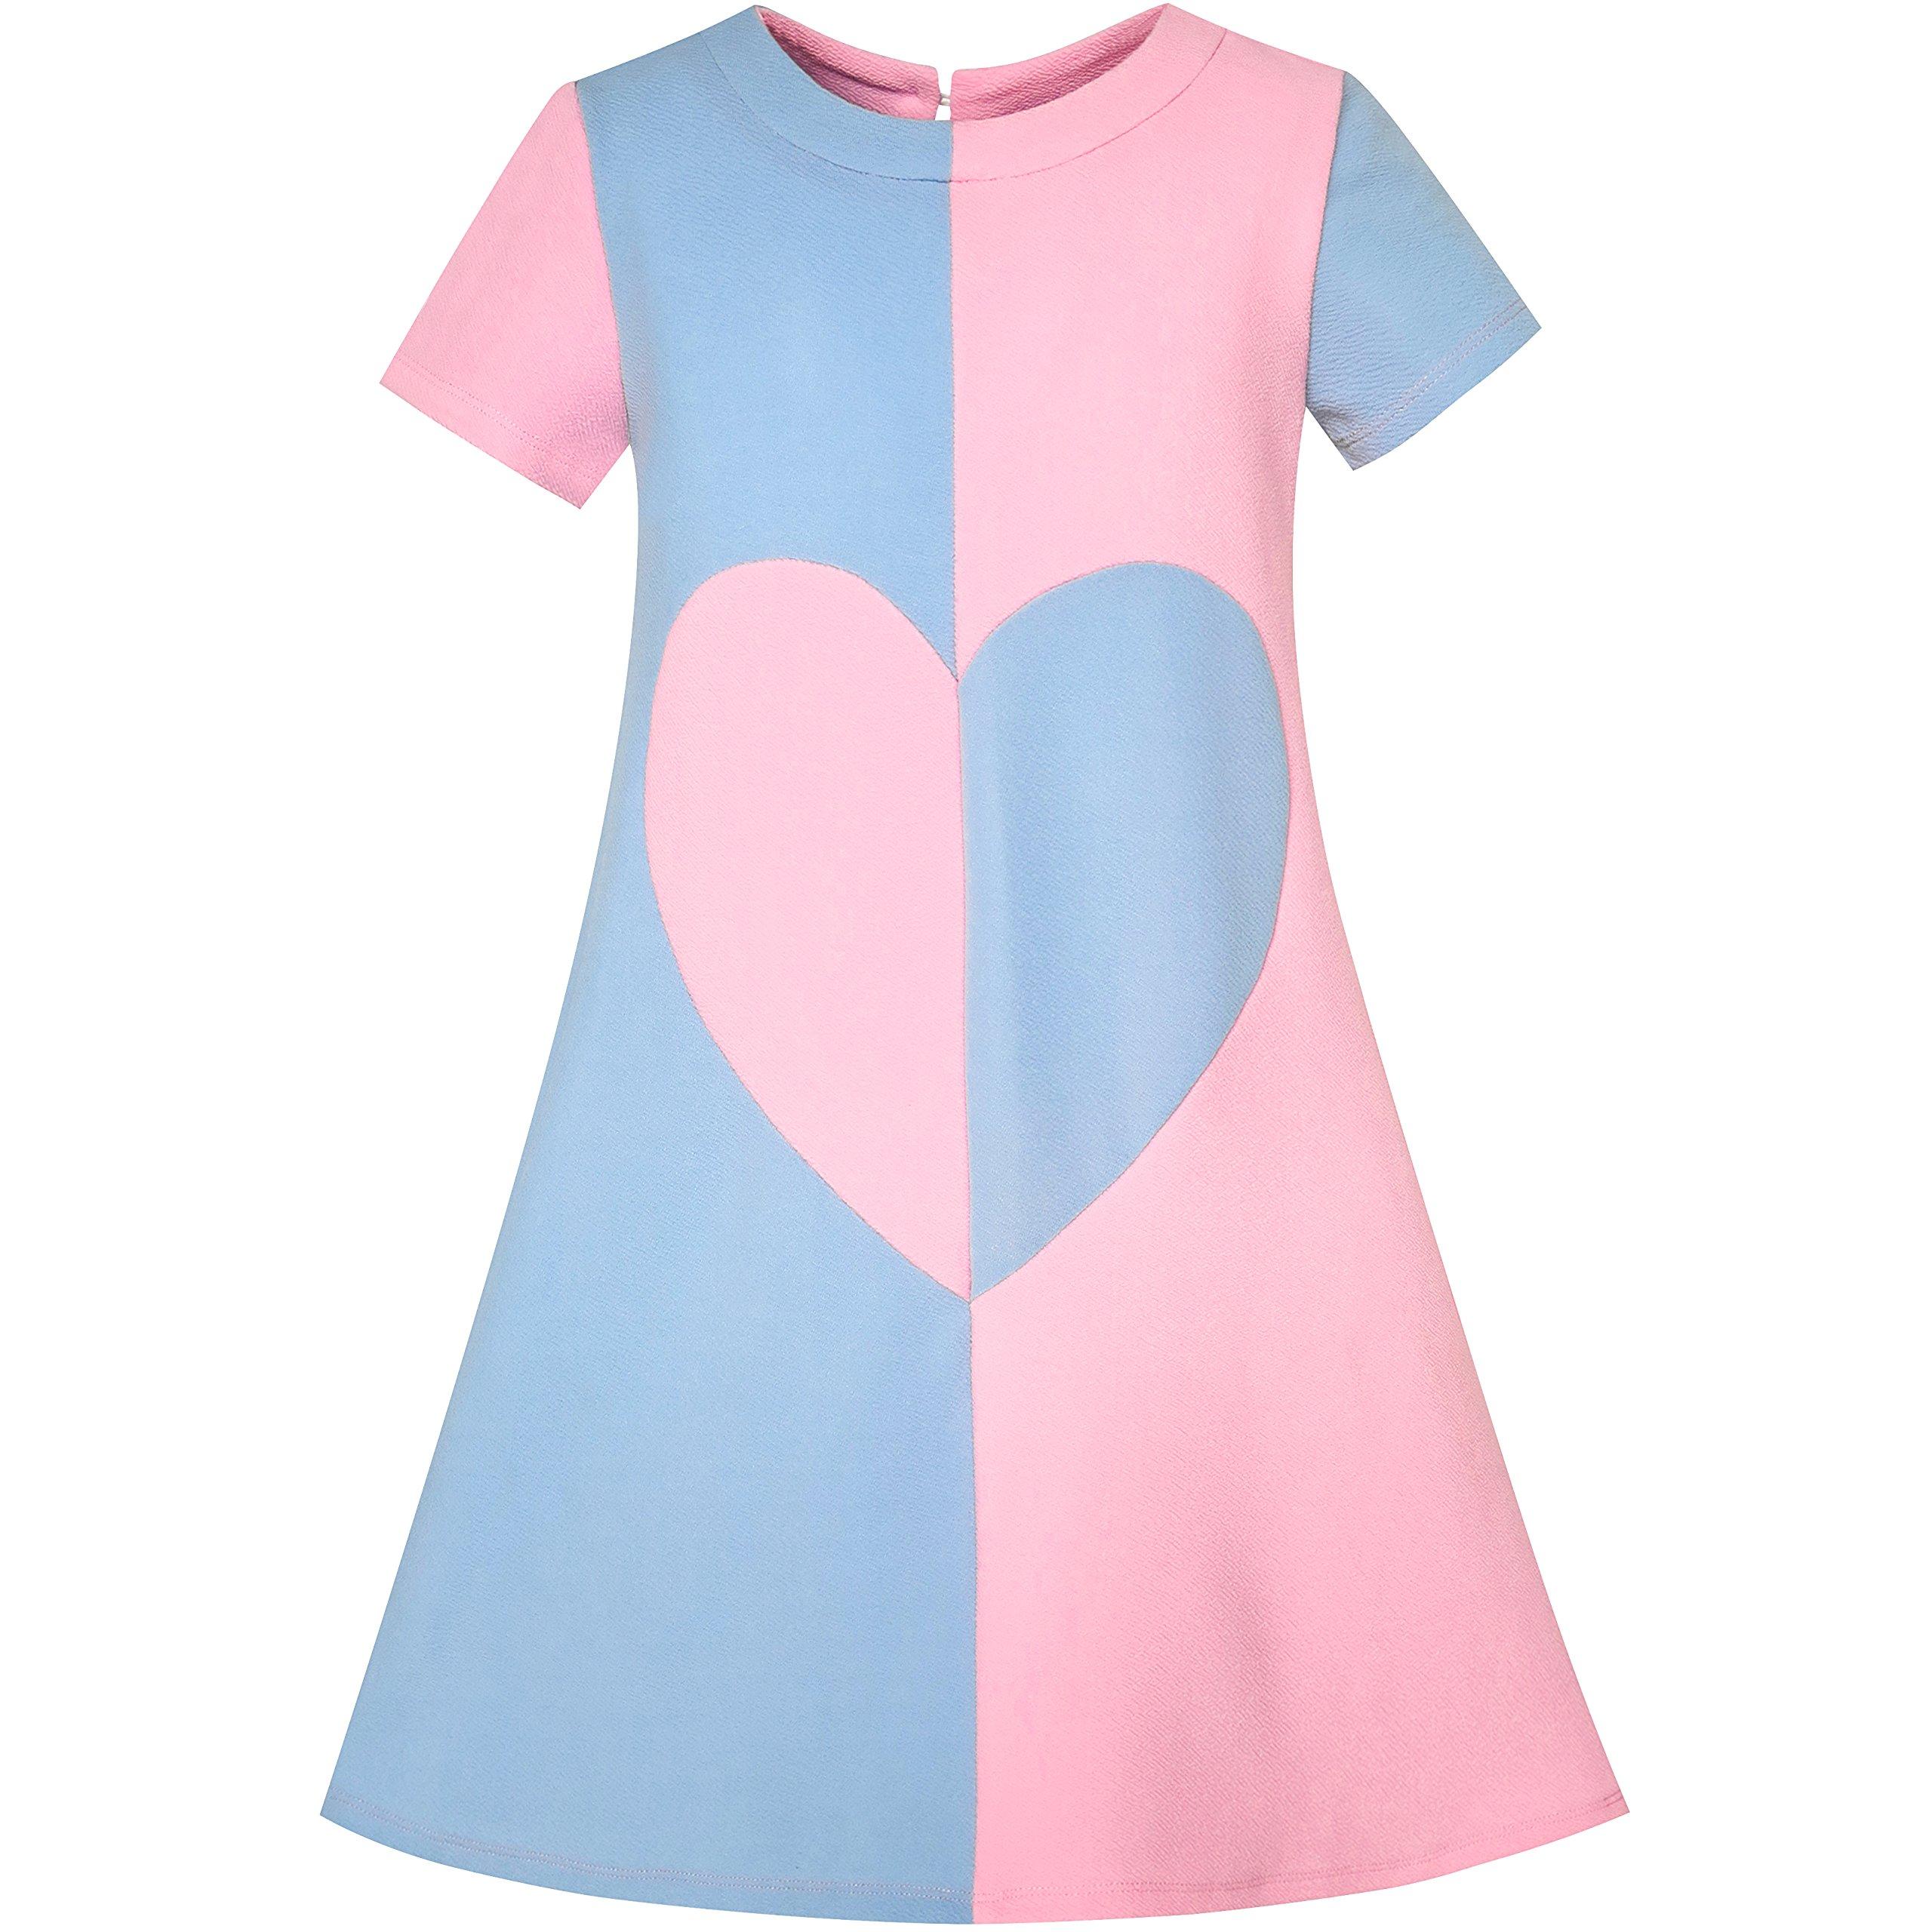 Sunny Fashion LE31 Girls Dress Blue Color Contrast Heart A-line Size 5